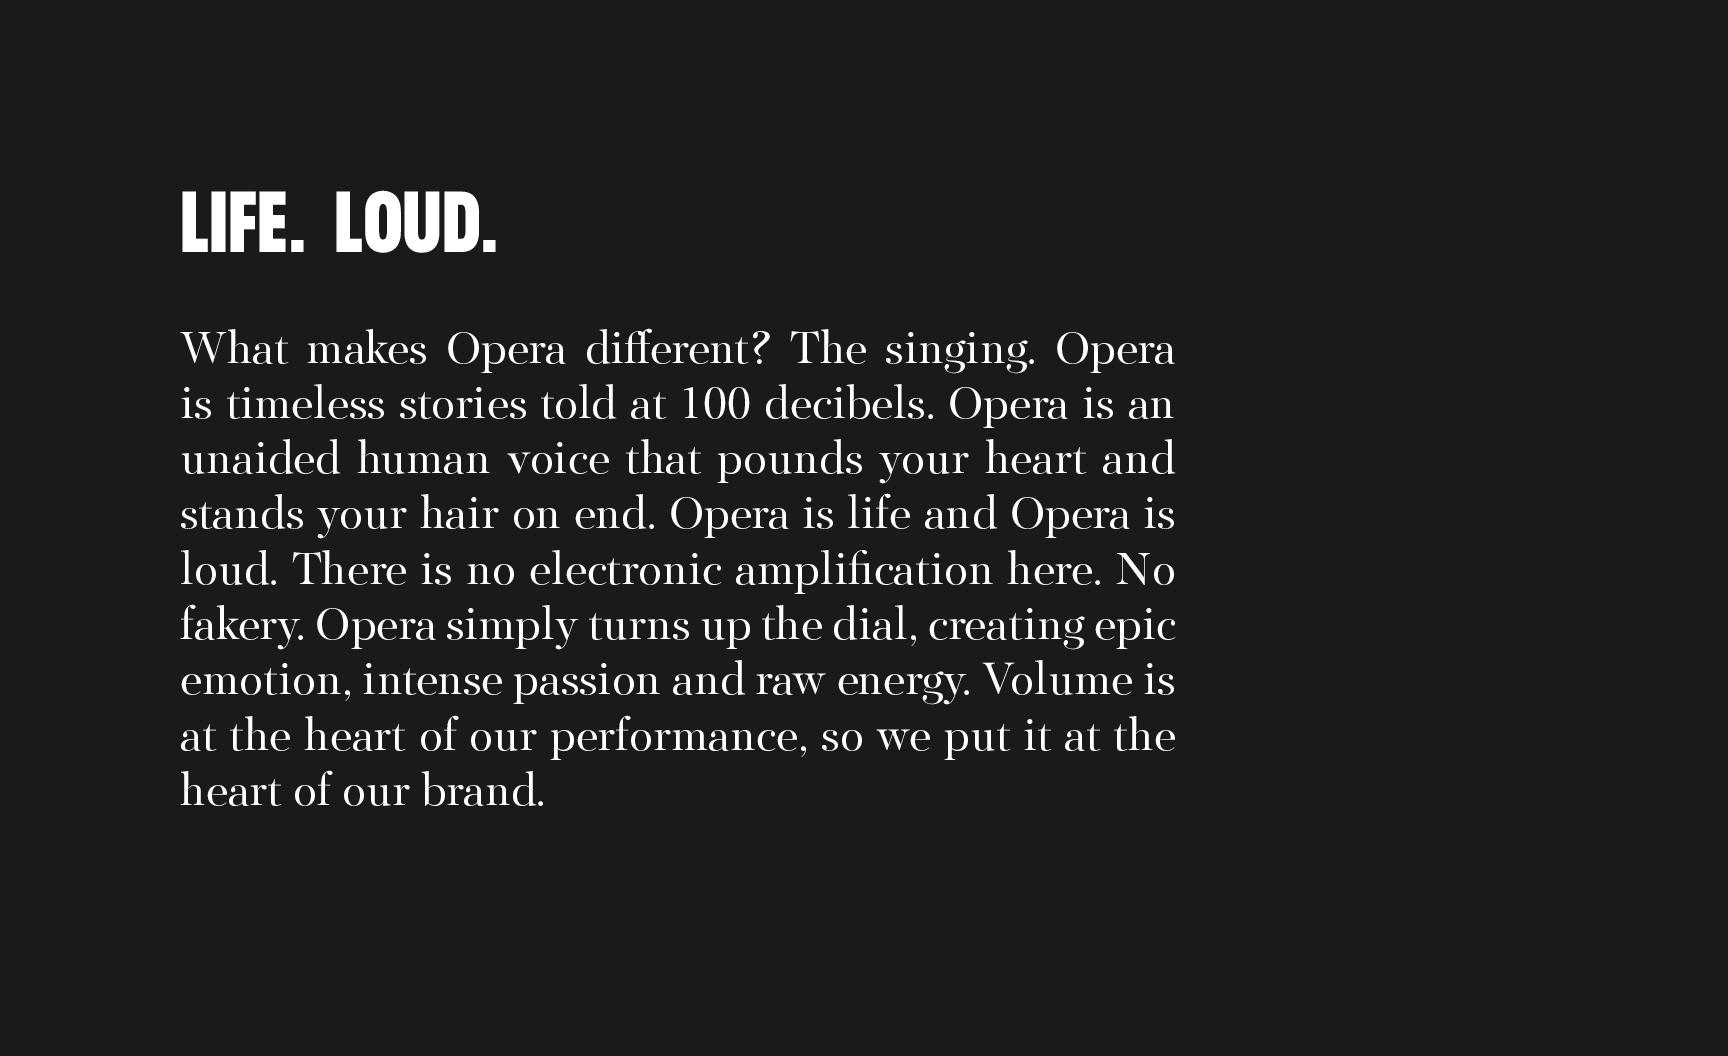 Opera_Prez_case study_10.29.152.jpg